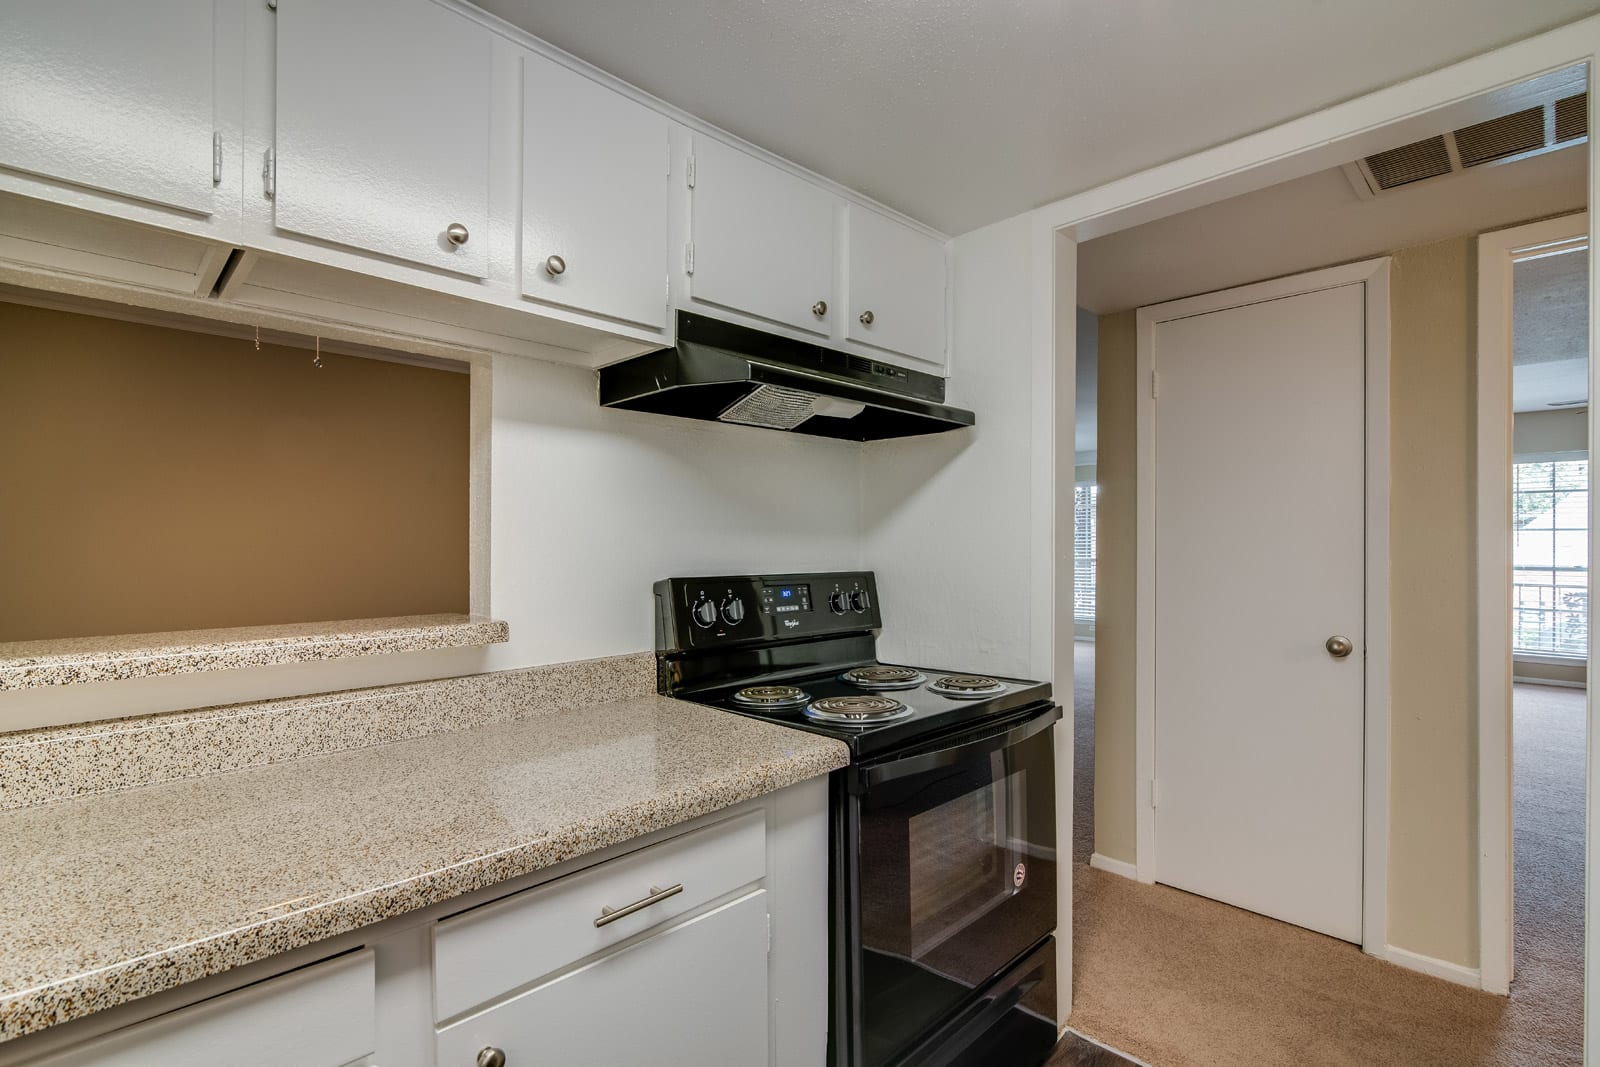 Energy Efficient Appliances at Allen House Apartments, Houston, Texas